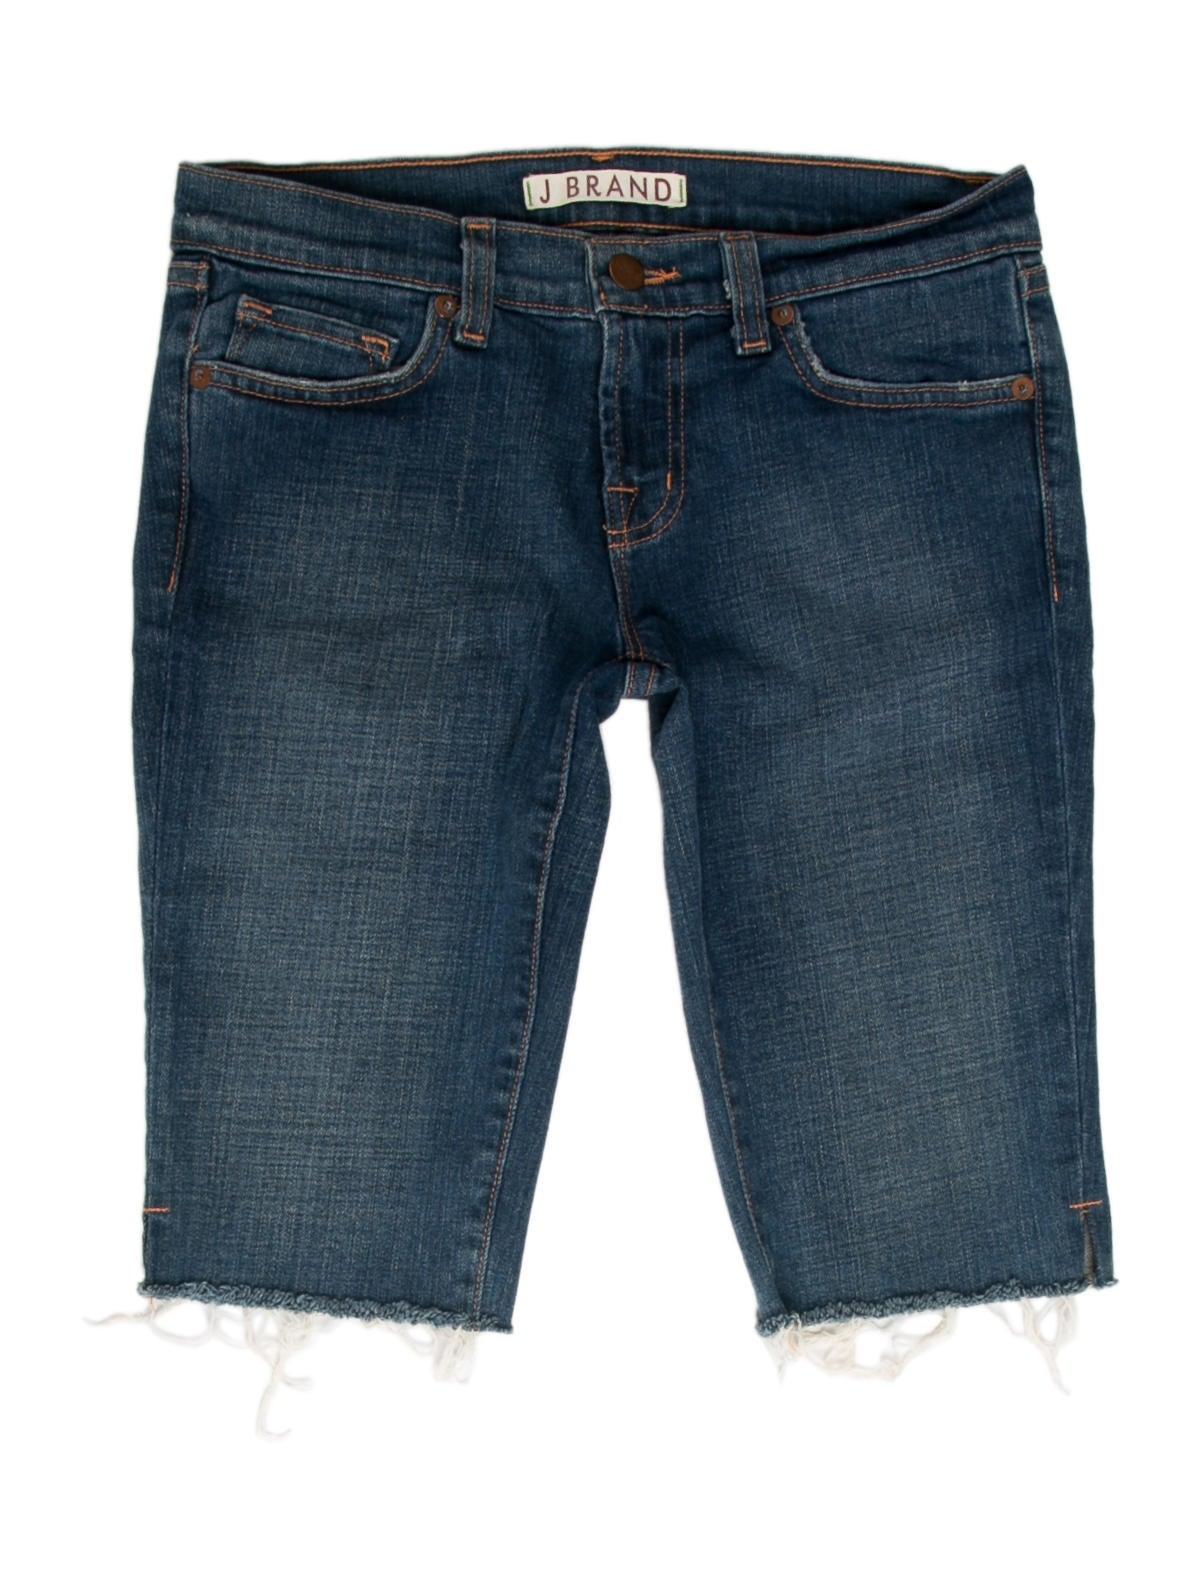 J Brand Knee-Length Denim Shorts - Clothing - WJB26068 ...